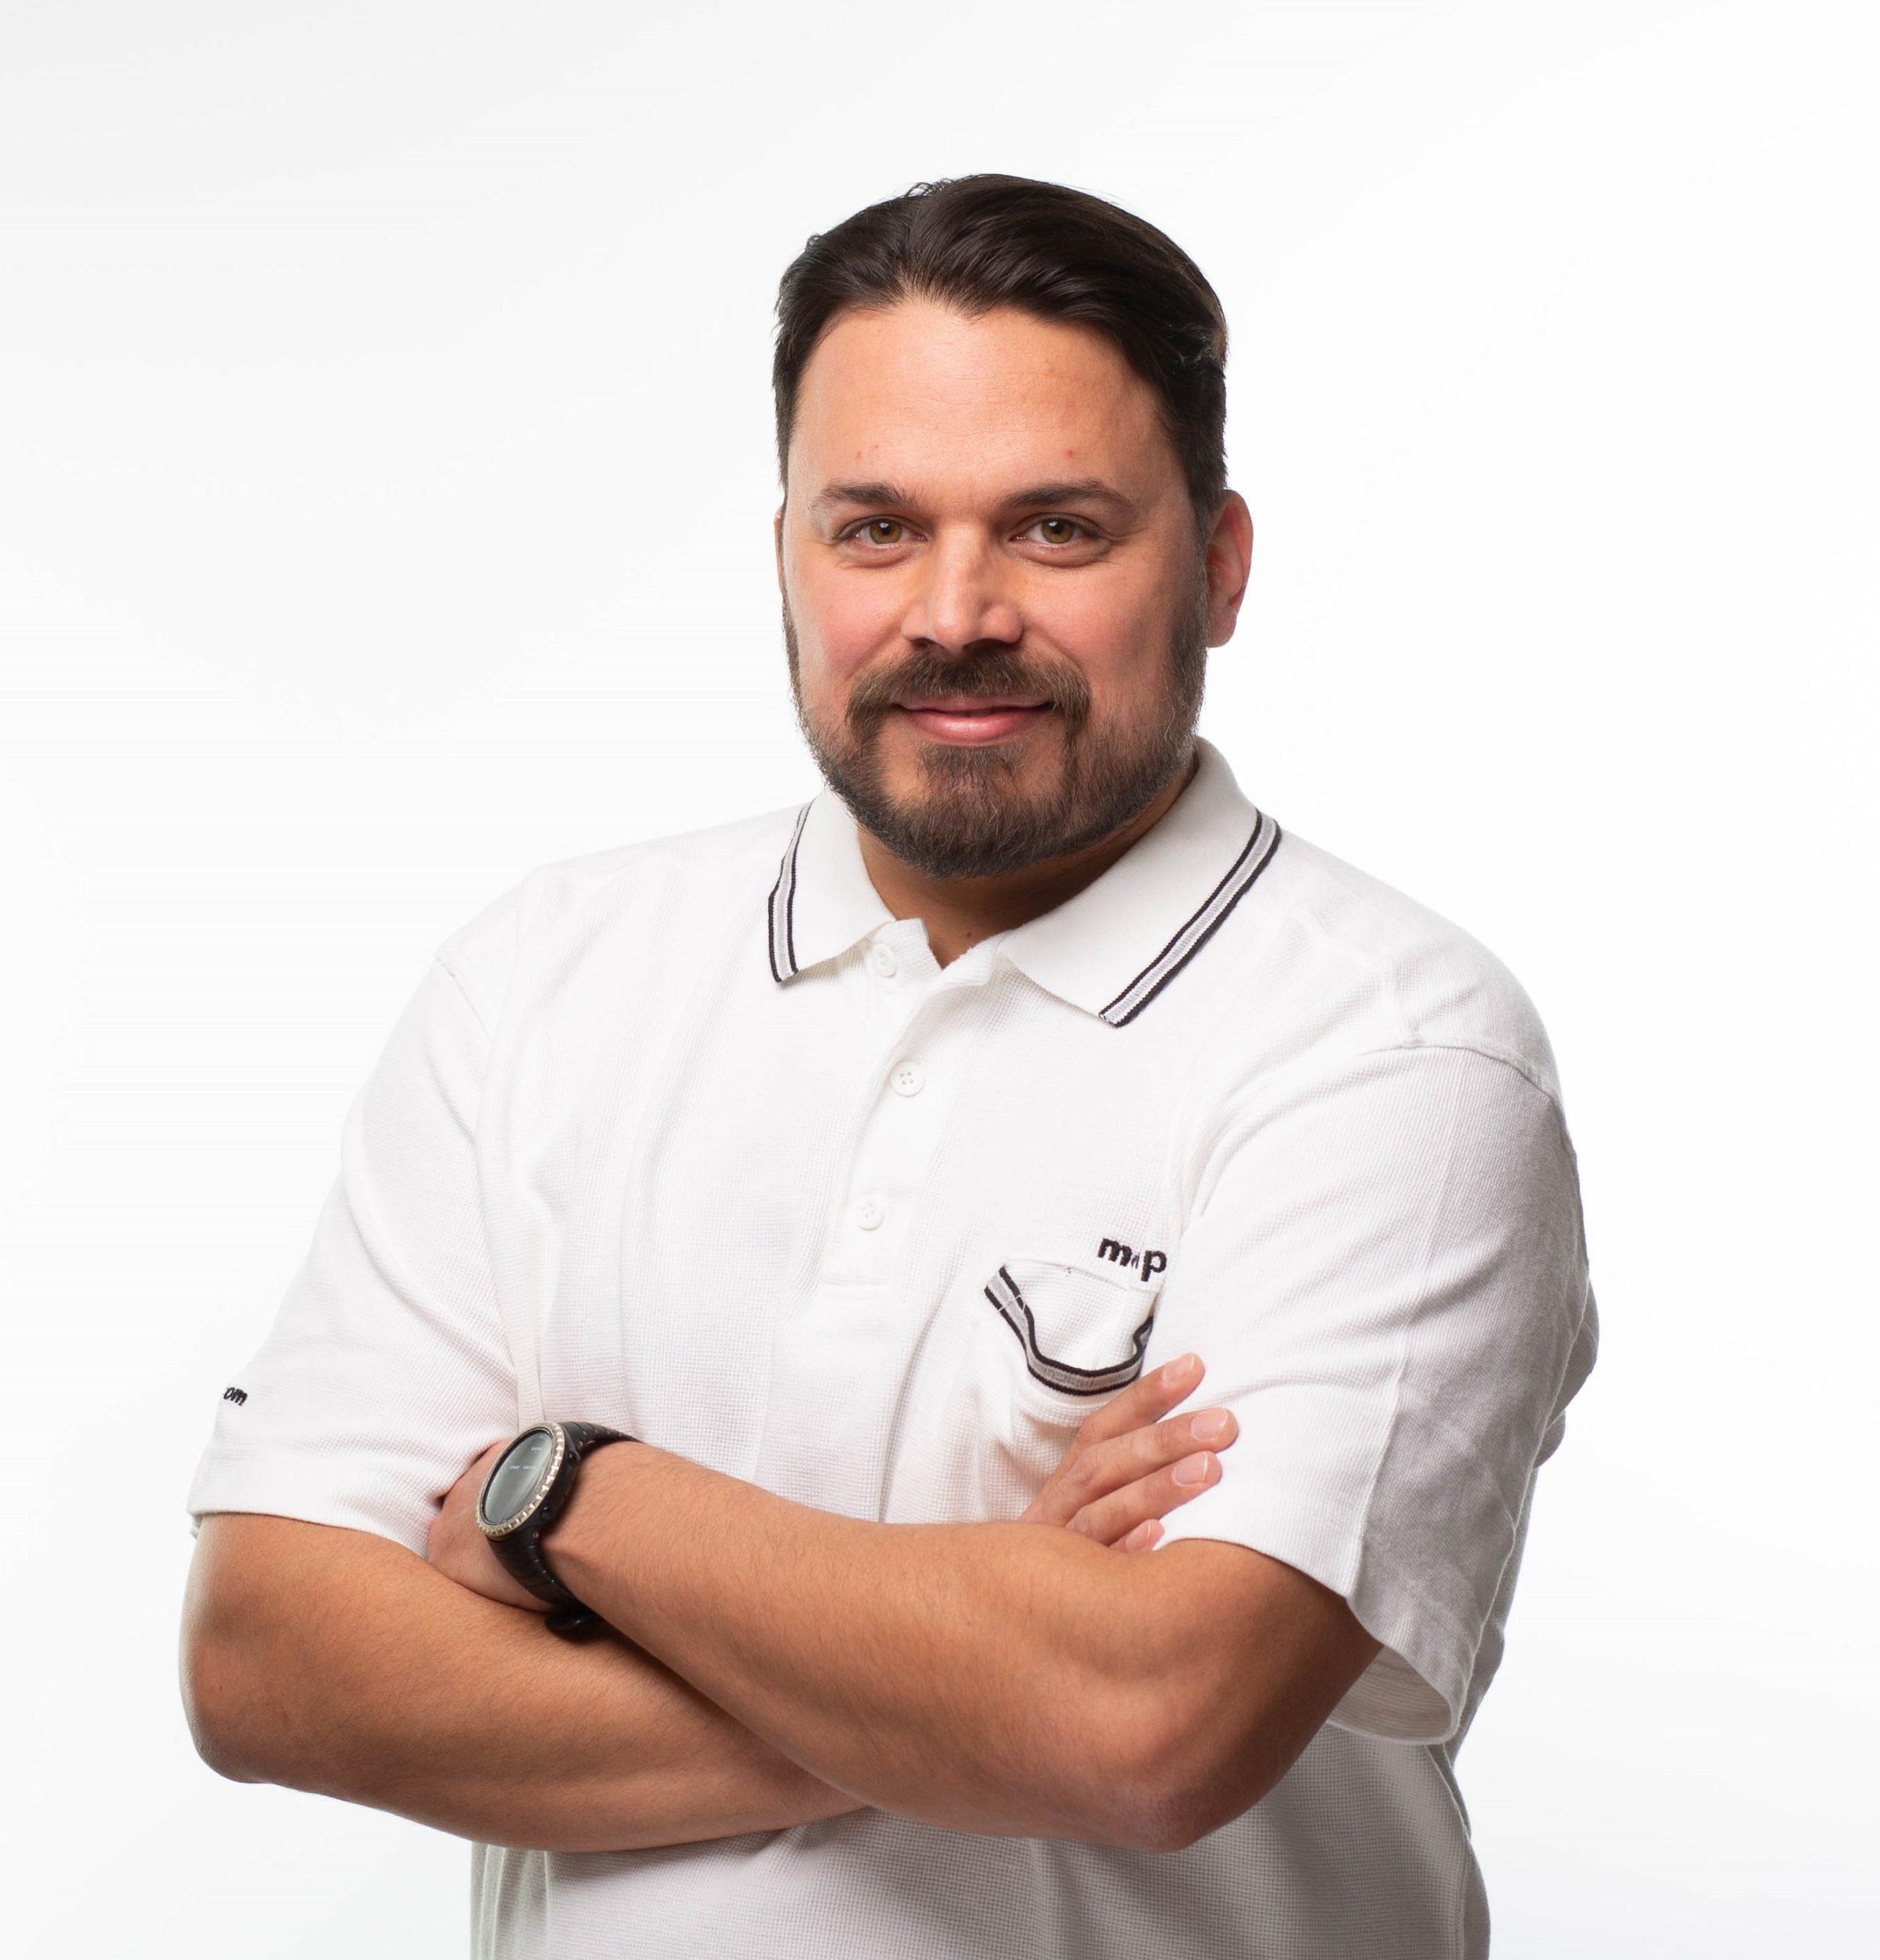 Dr. Fabian Gerber